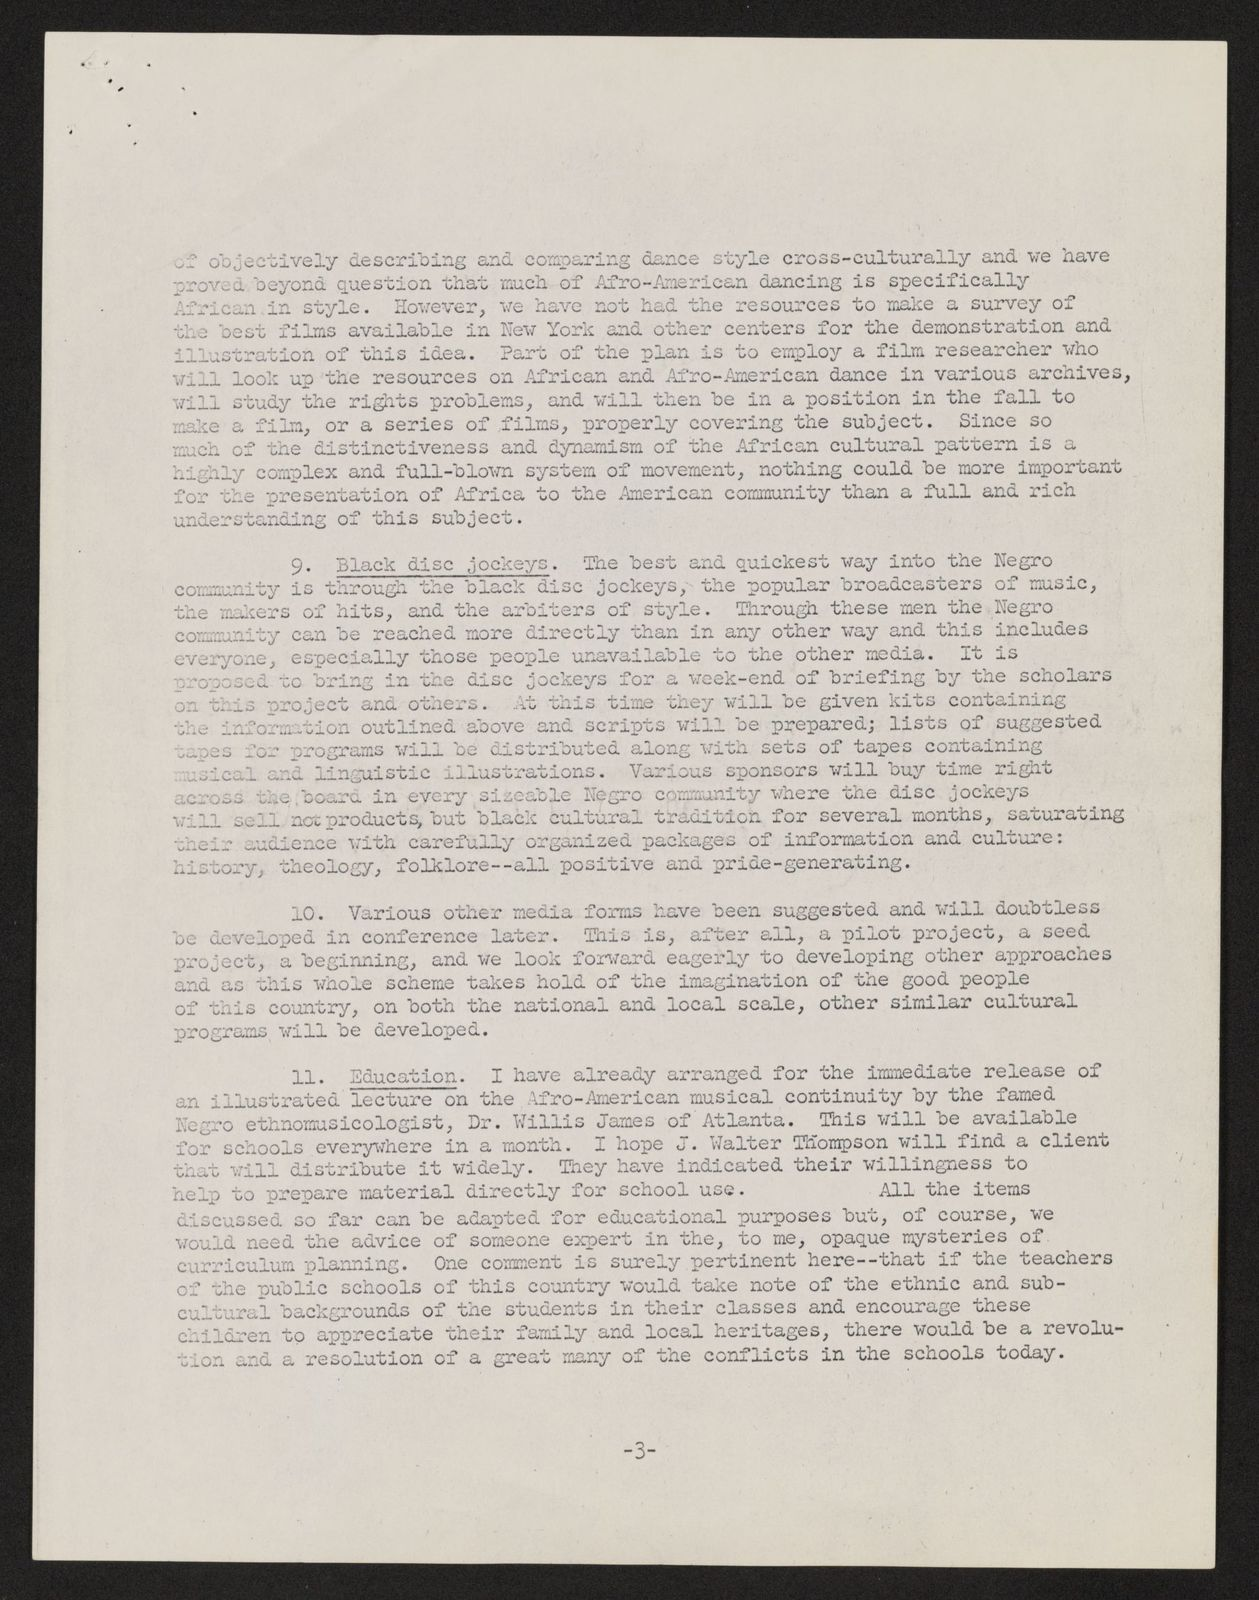 Alan Lomax Collection, Manuscripts, Black Identity Project, 1968-1970, administrative